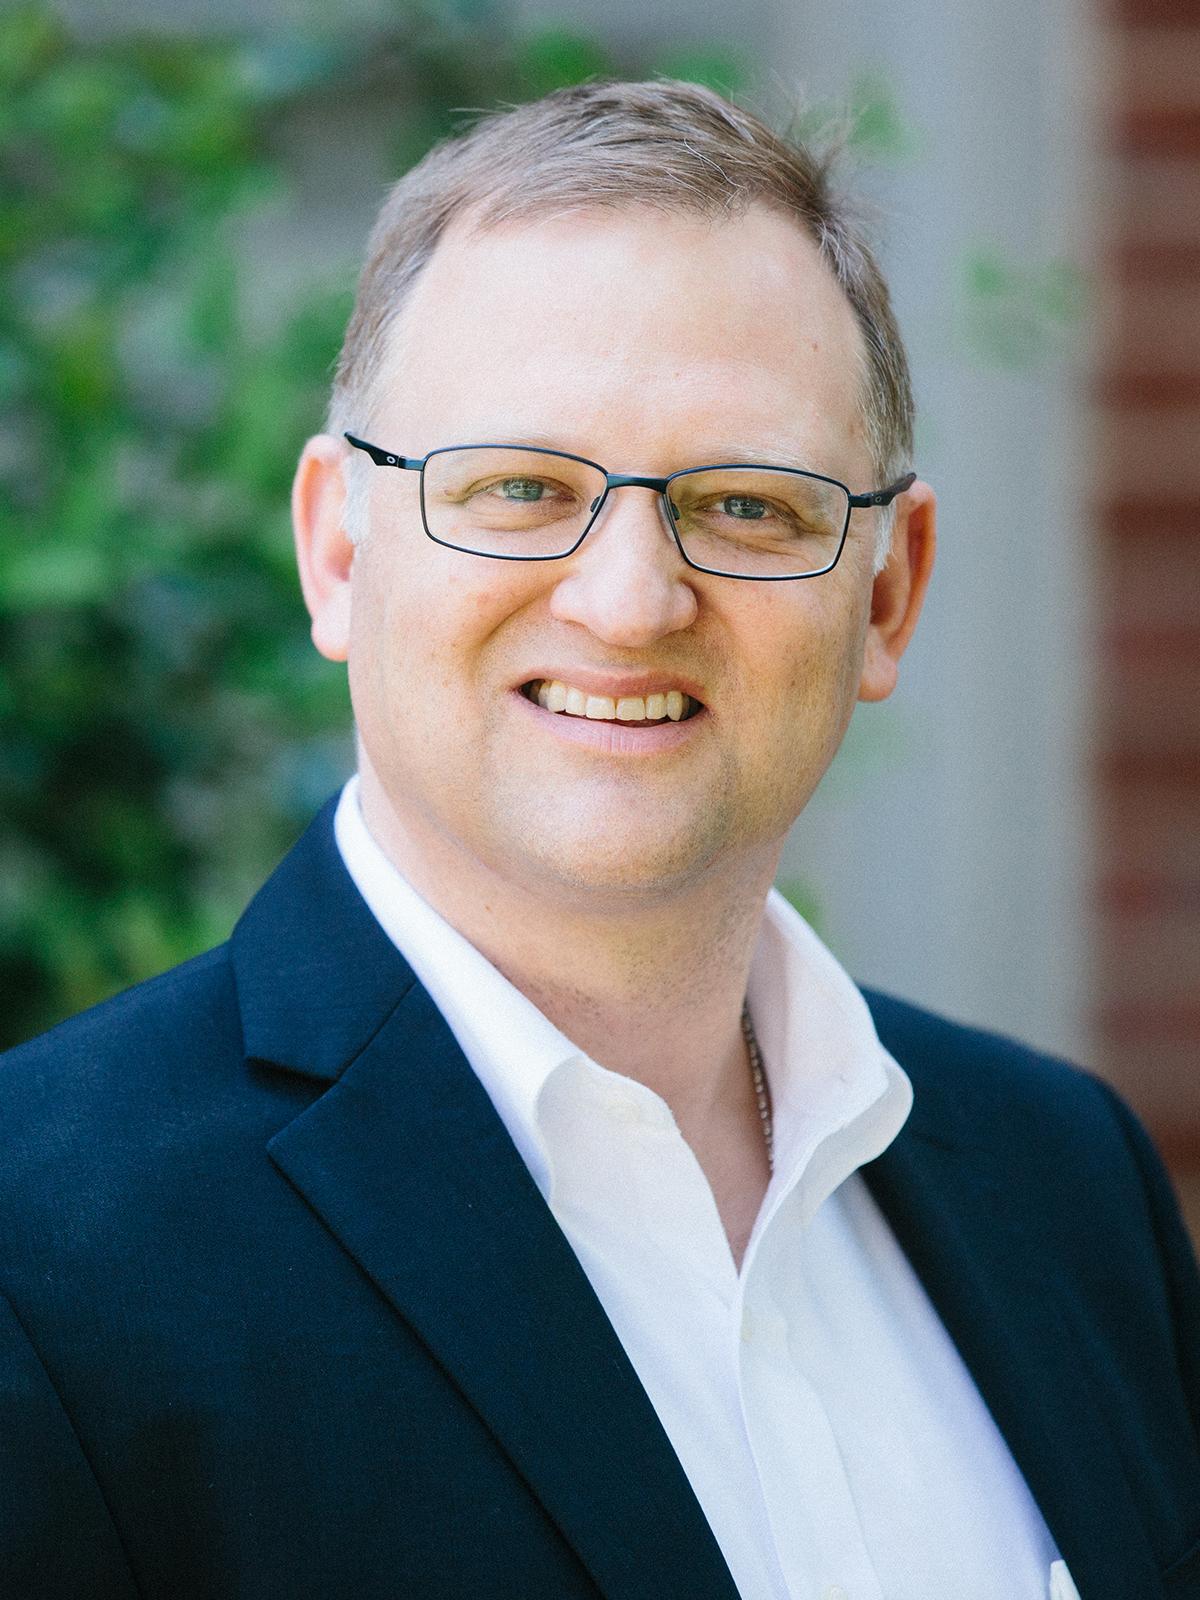 Eric Houck portrait image